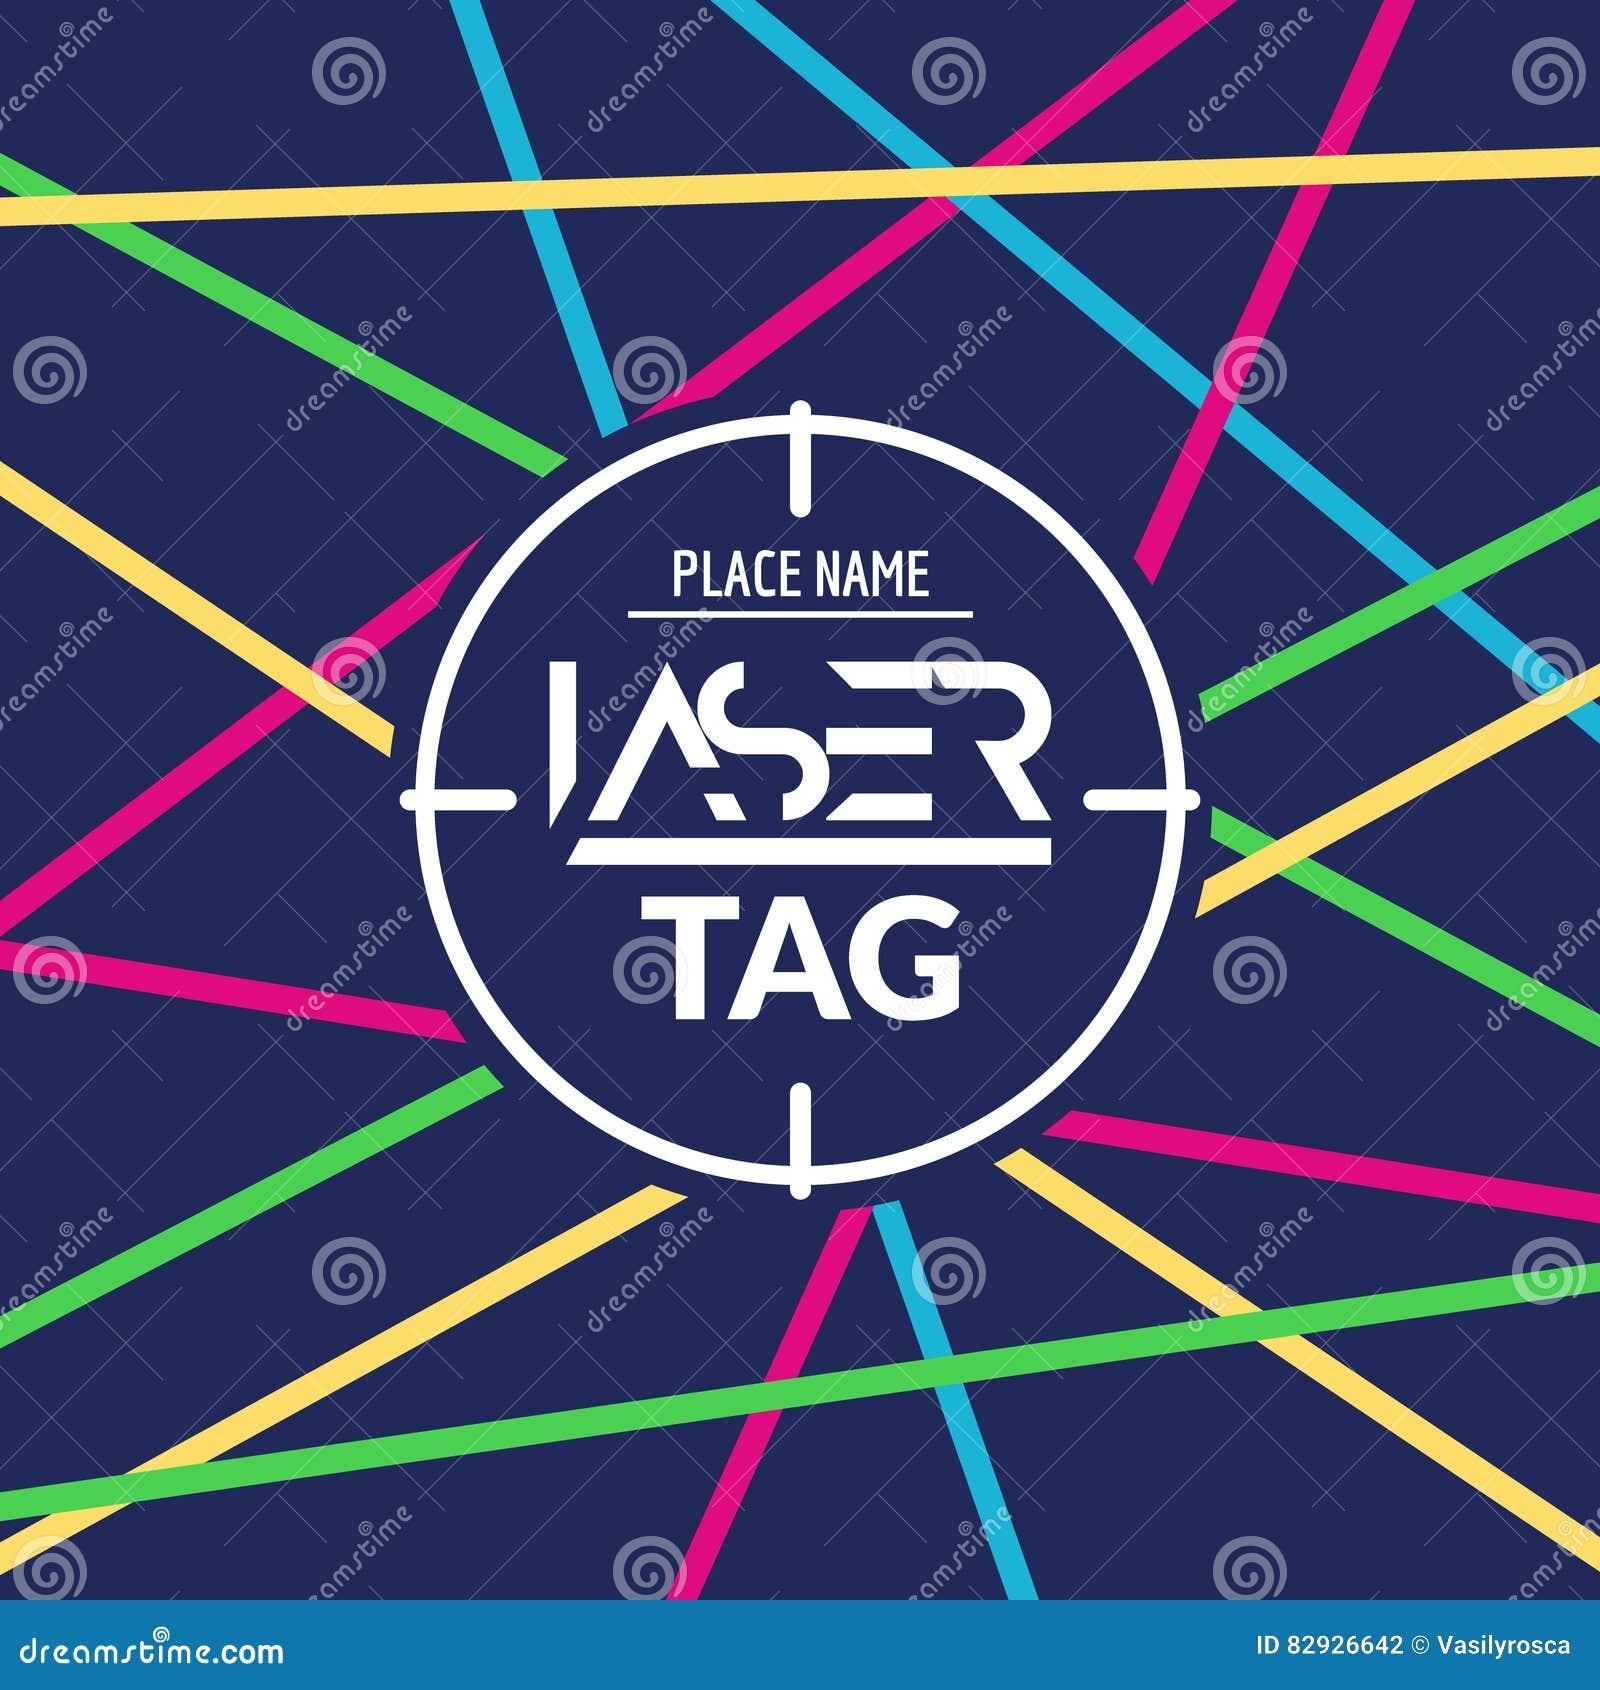 Laser Tag Party Invitation stock vector. Illustration of kids - 23190996